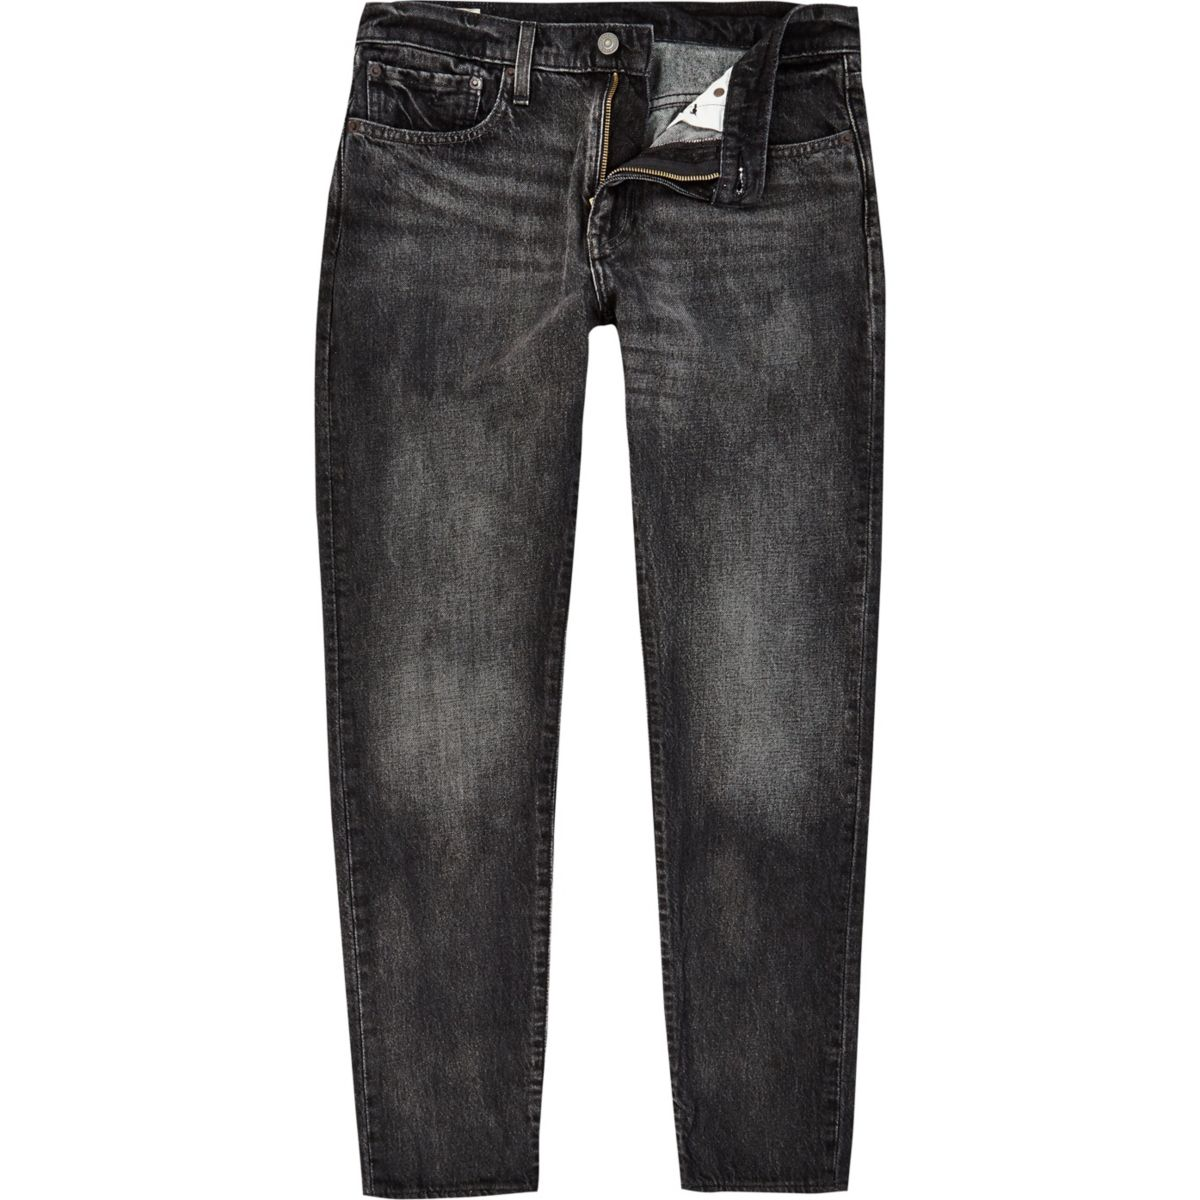 Levi's black denim 512 slim taper fit jeans